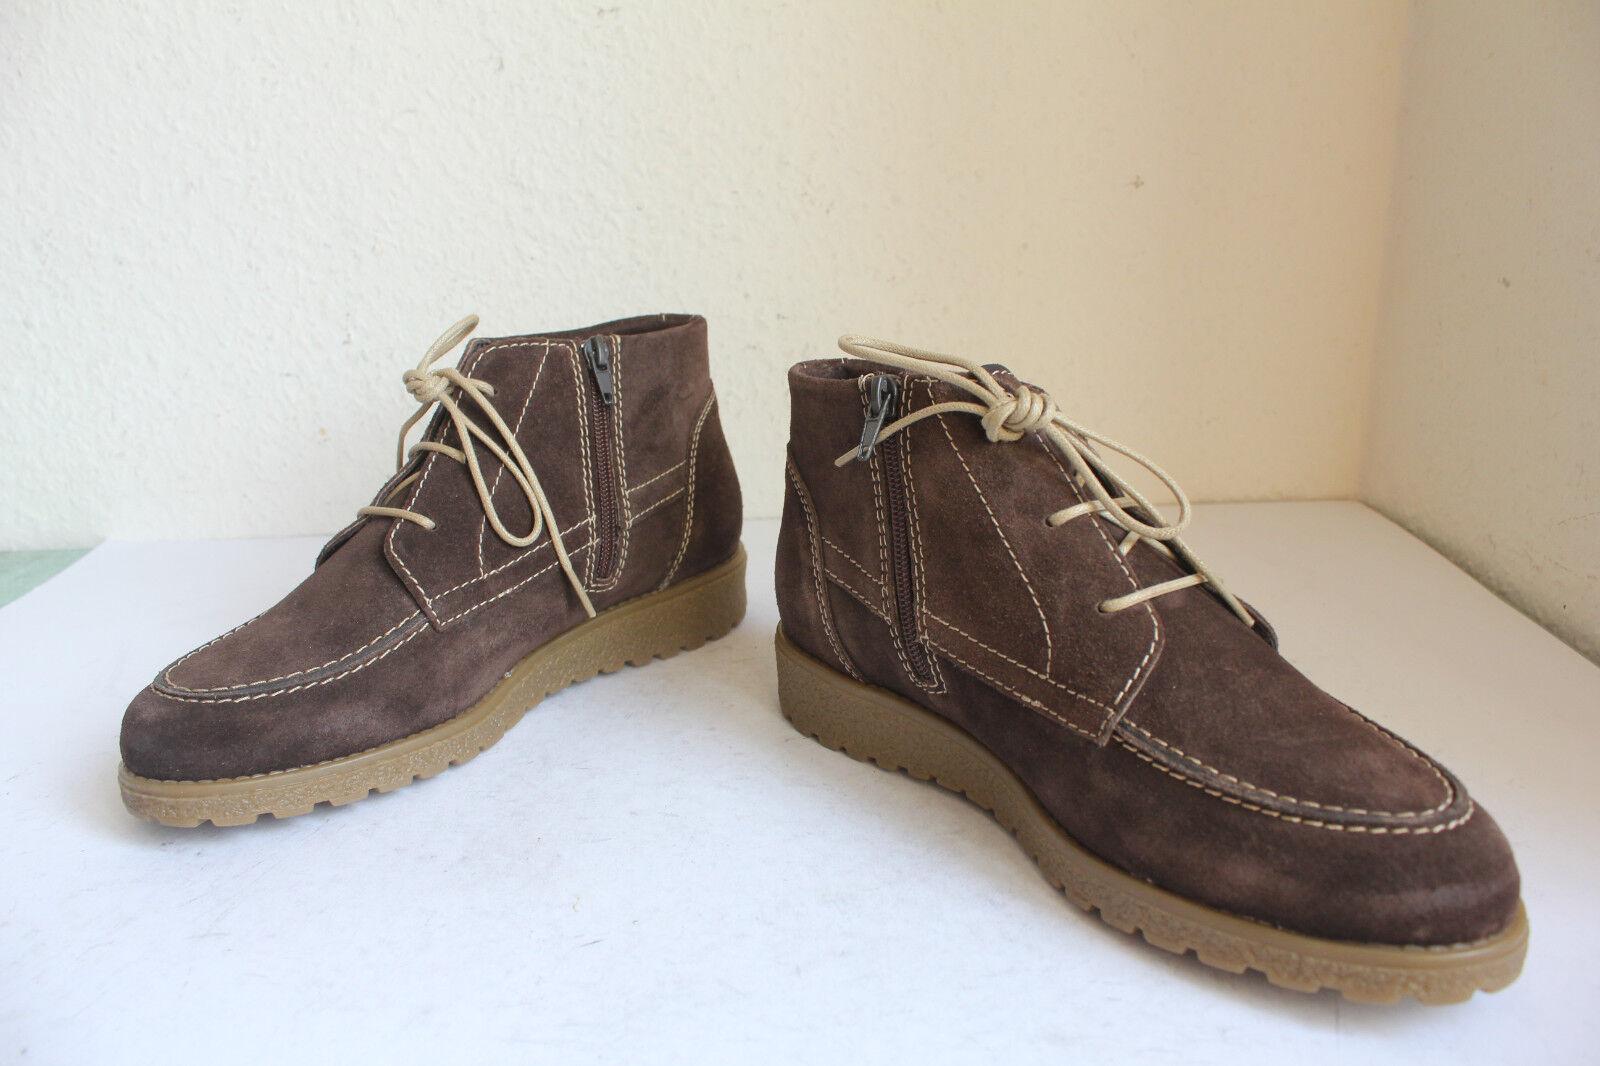 Filipe zapatos elegante schnürbotasetten botas de gamuza marrón eu 40 --- como nuevo